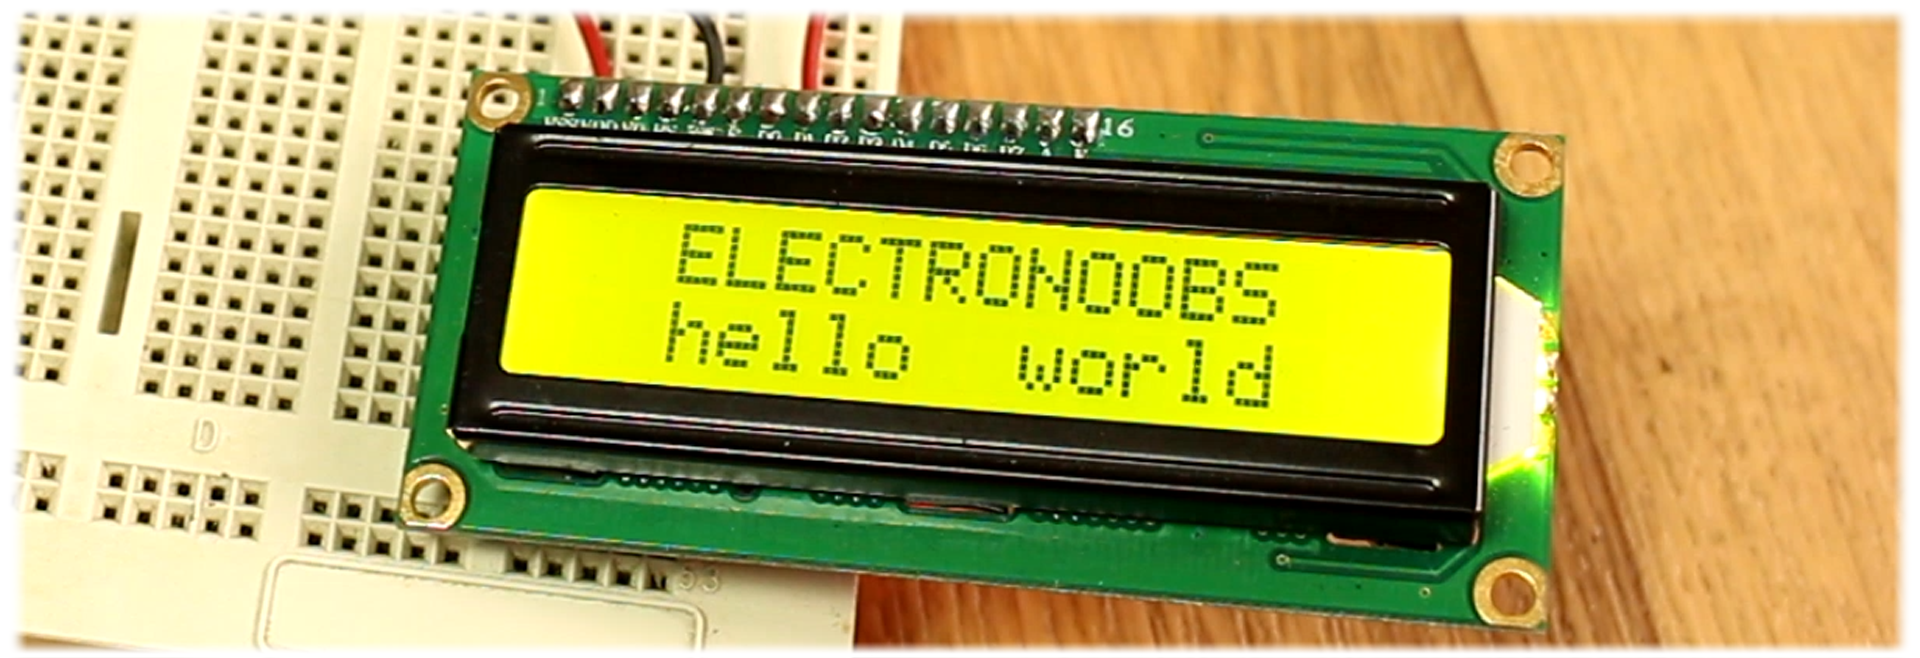 i2c LCD arduino library tutorial